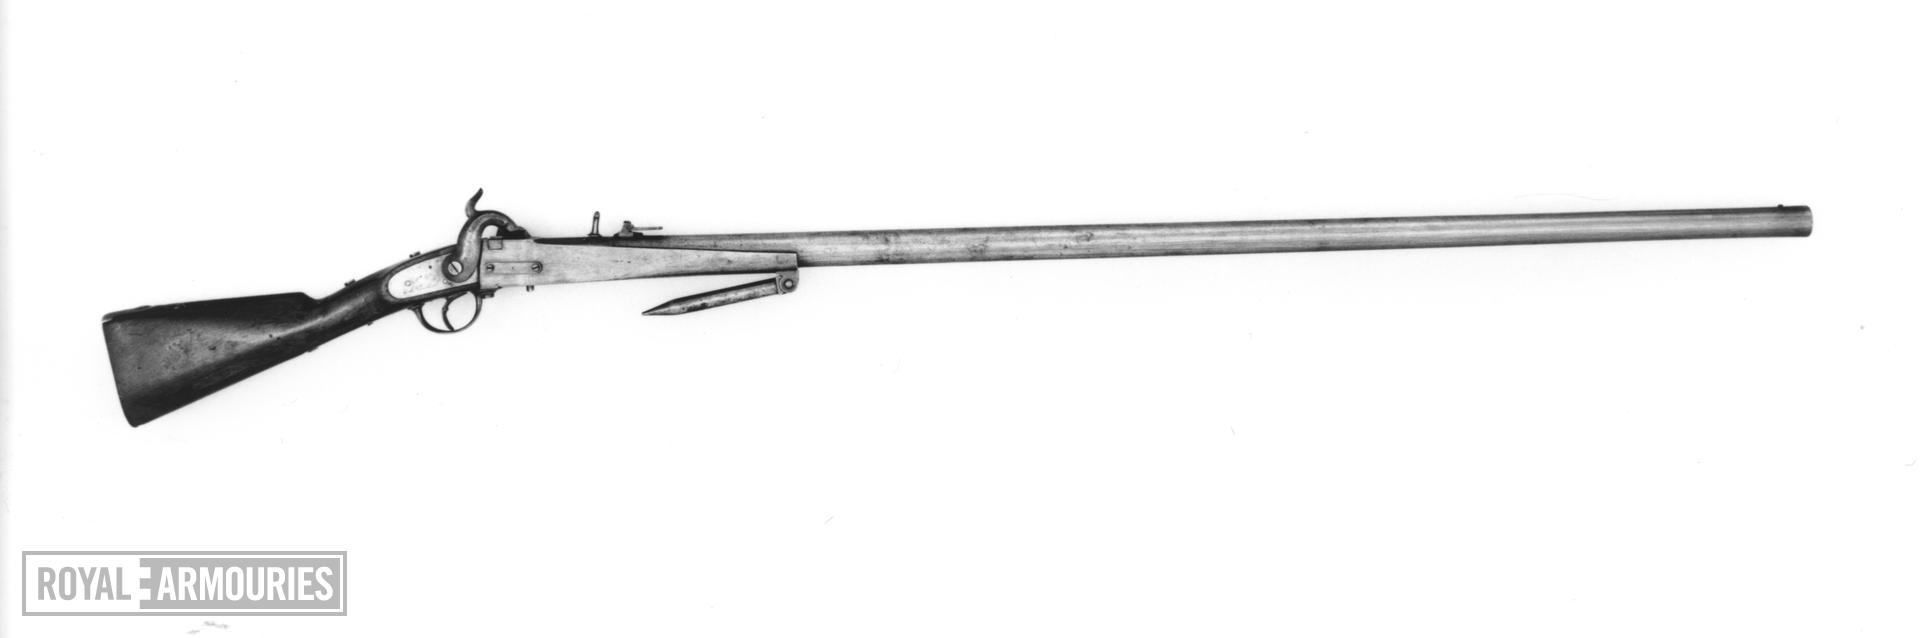 Percussion breech-loading military wall gun - Model 1831